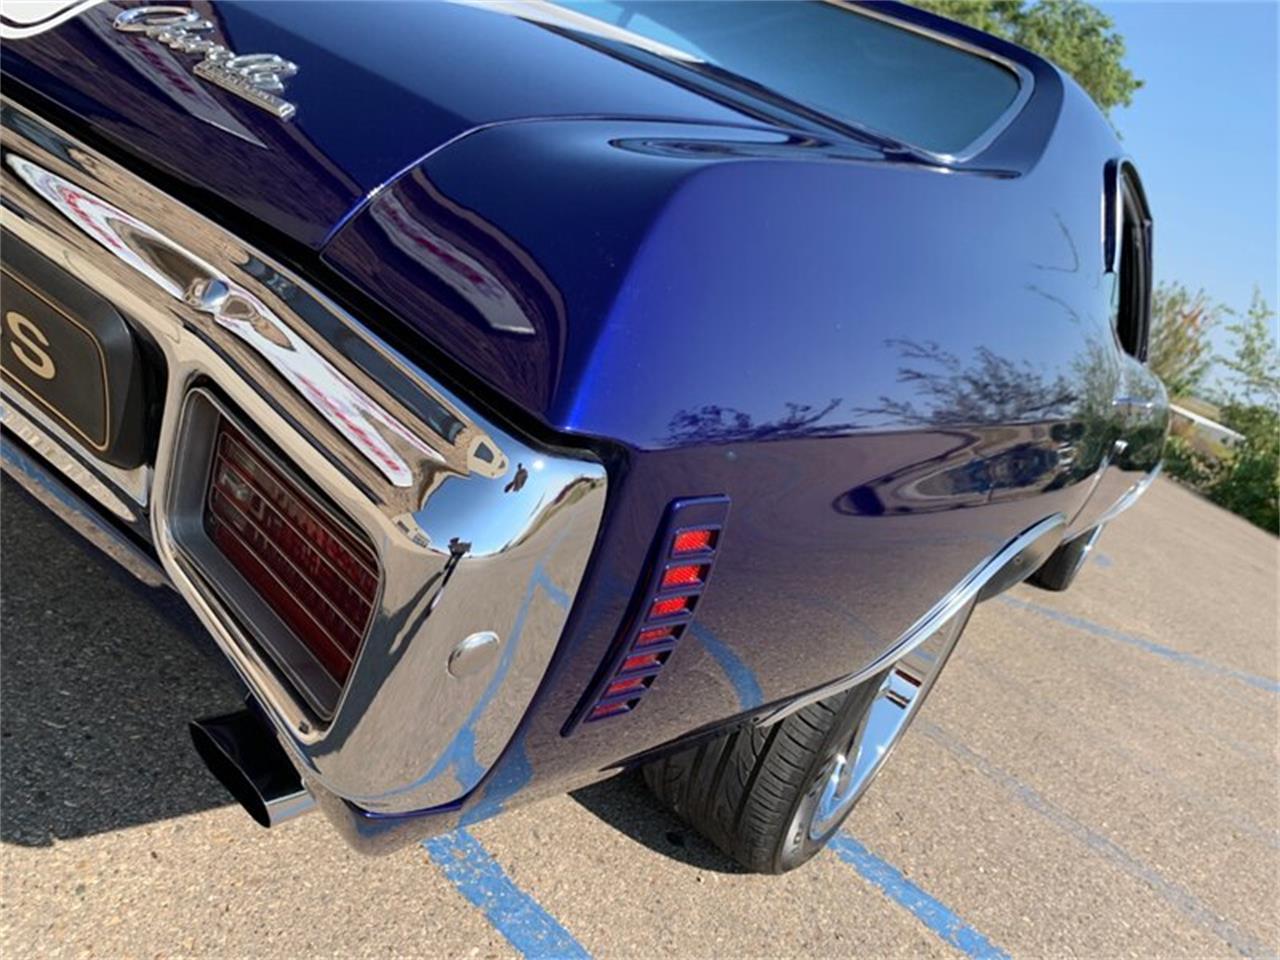 1970 Chevrolet Chevelle (CC-1385356) for sale in Bismarck, North Dakota